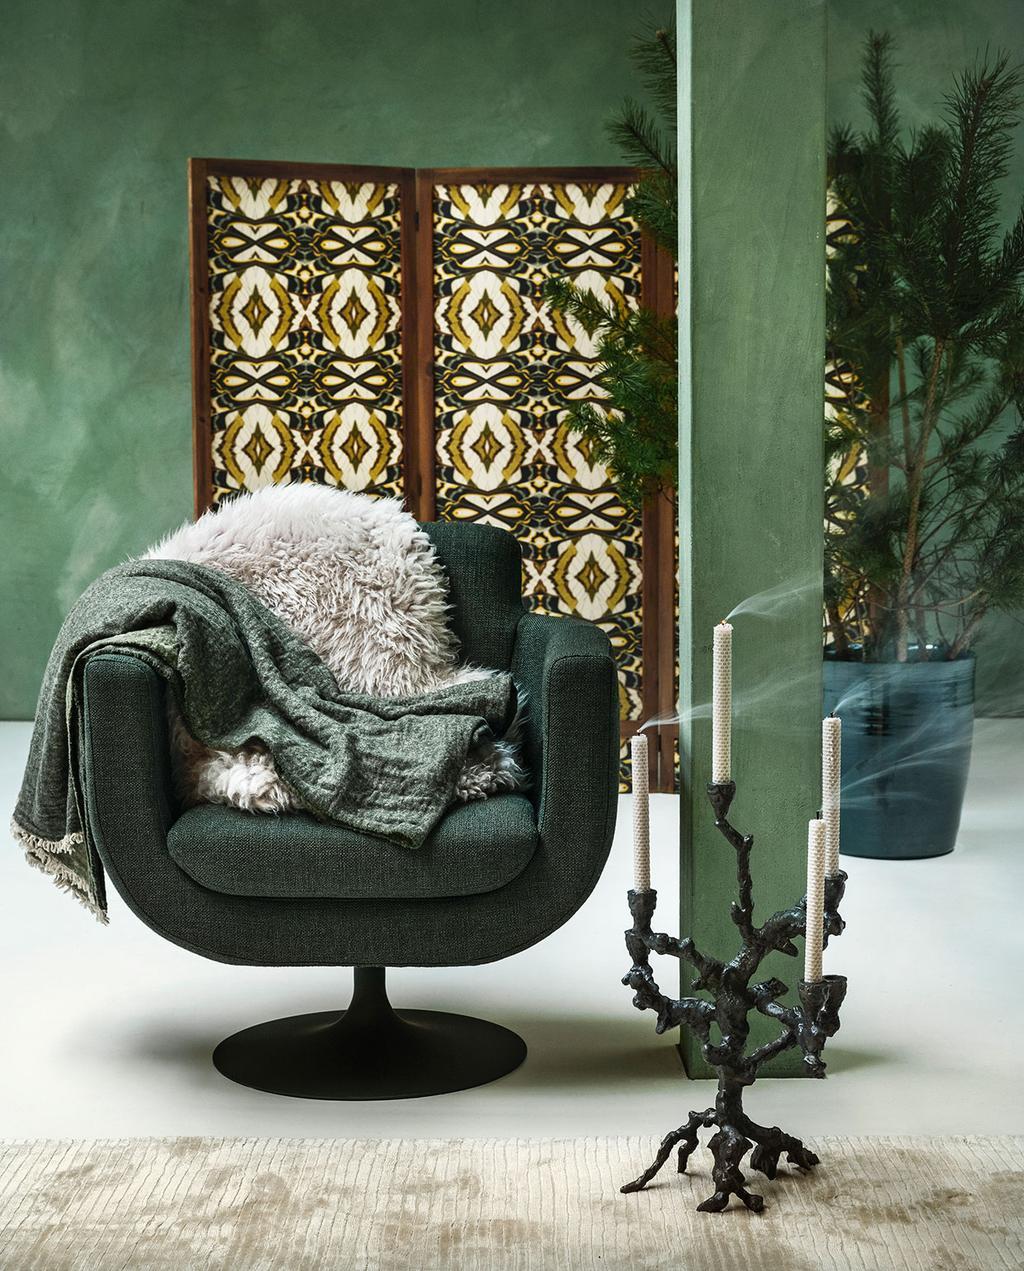 vtwonen 01-2021 | groene fauteuil met panelen op achtergrond